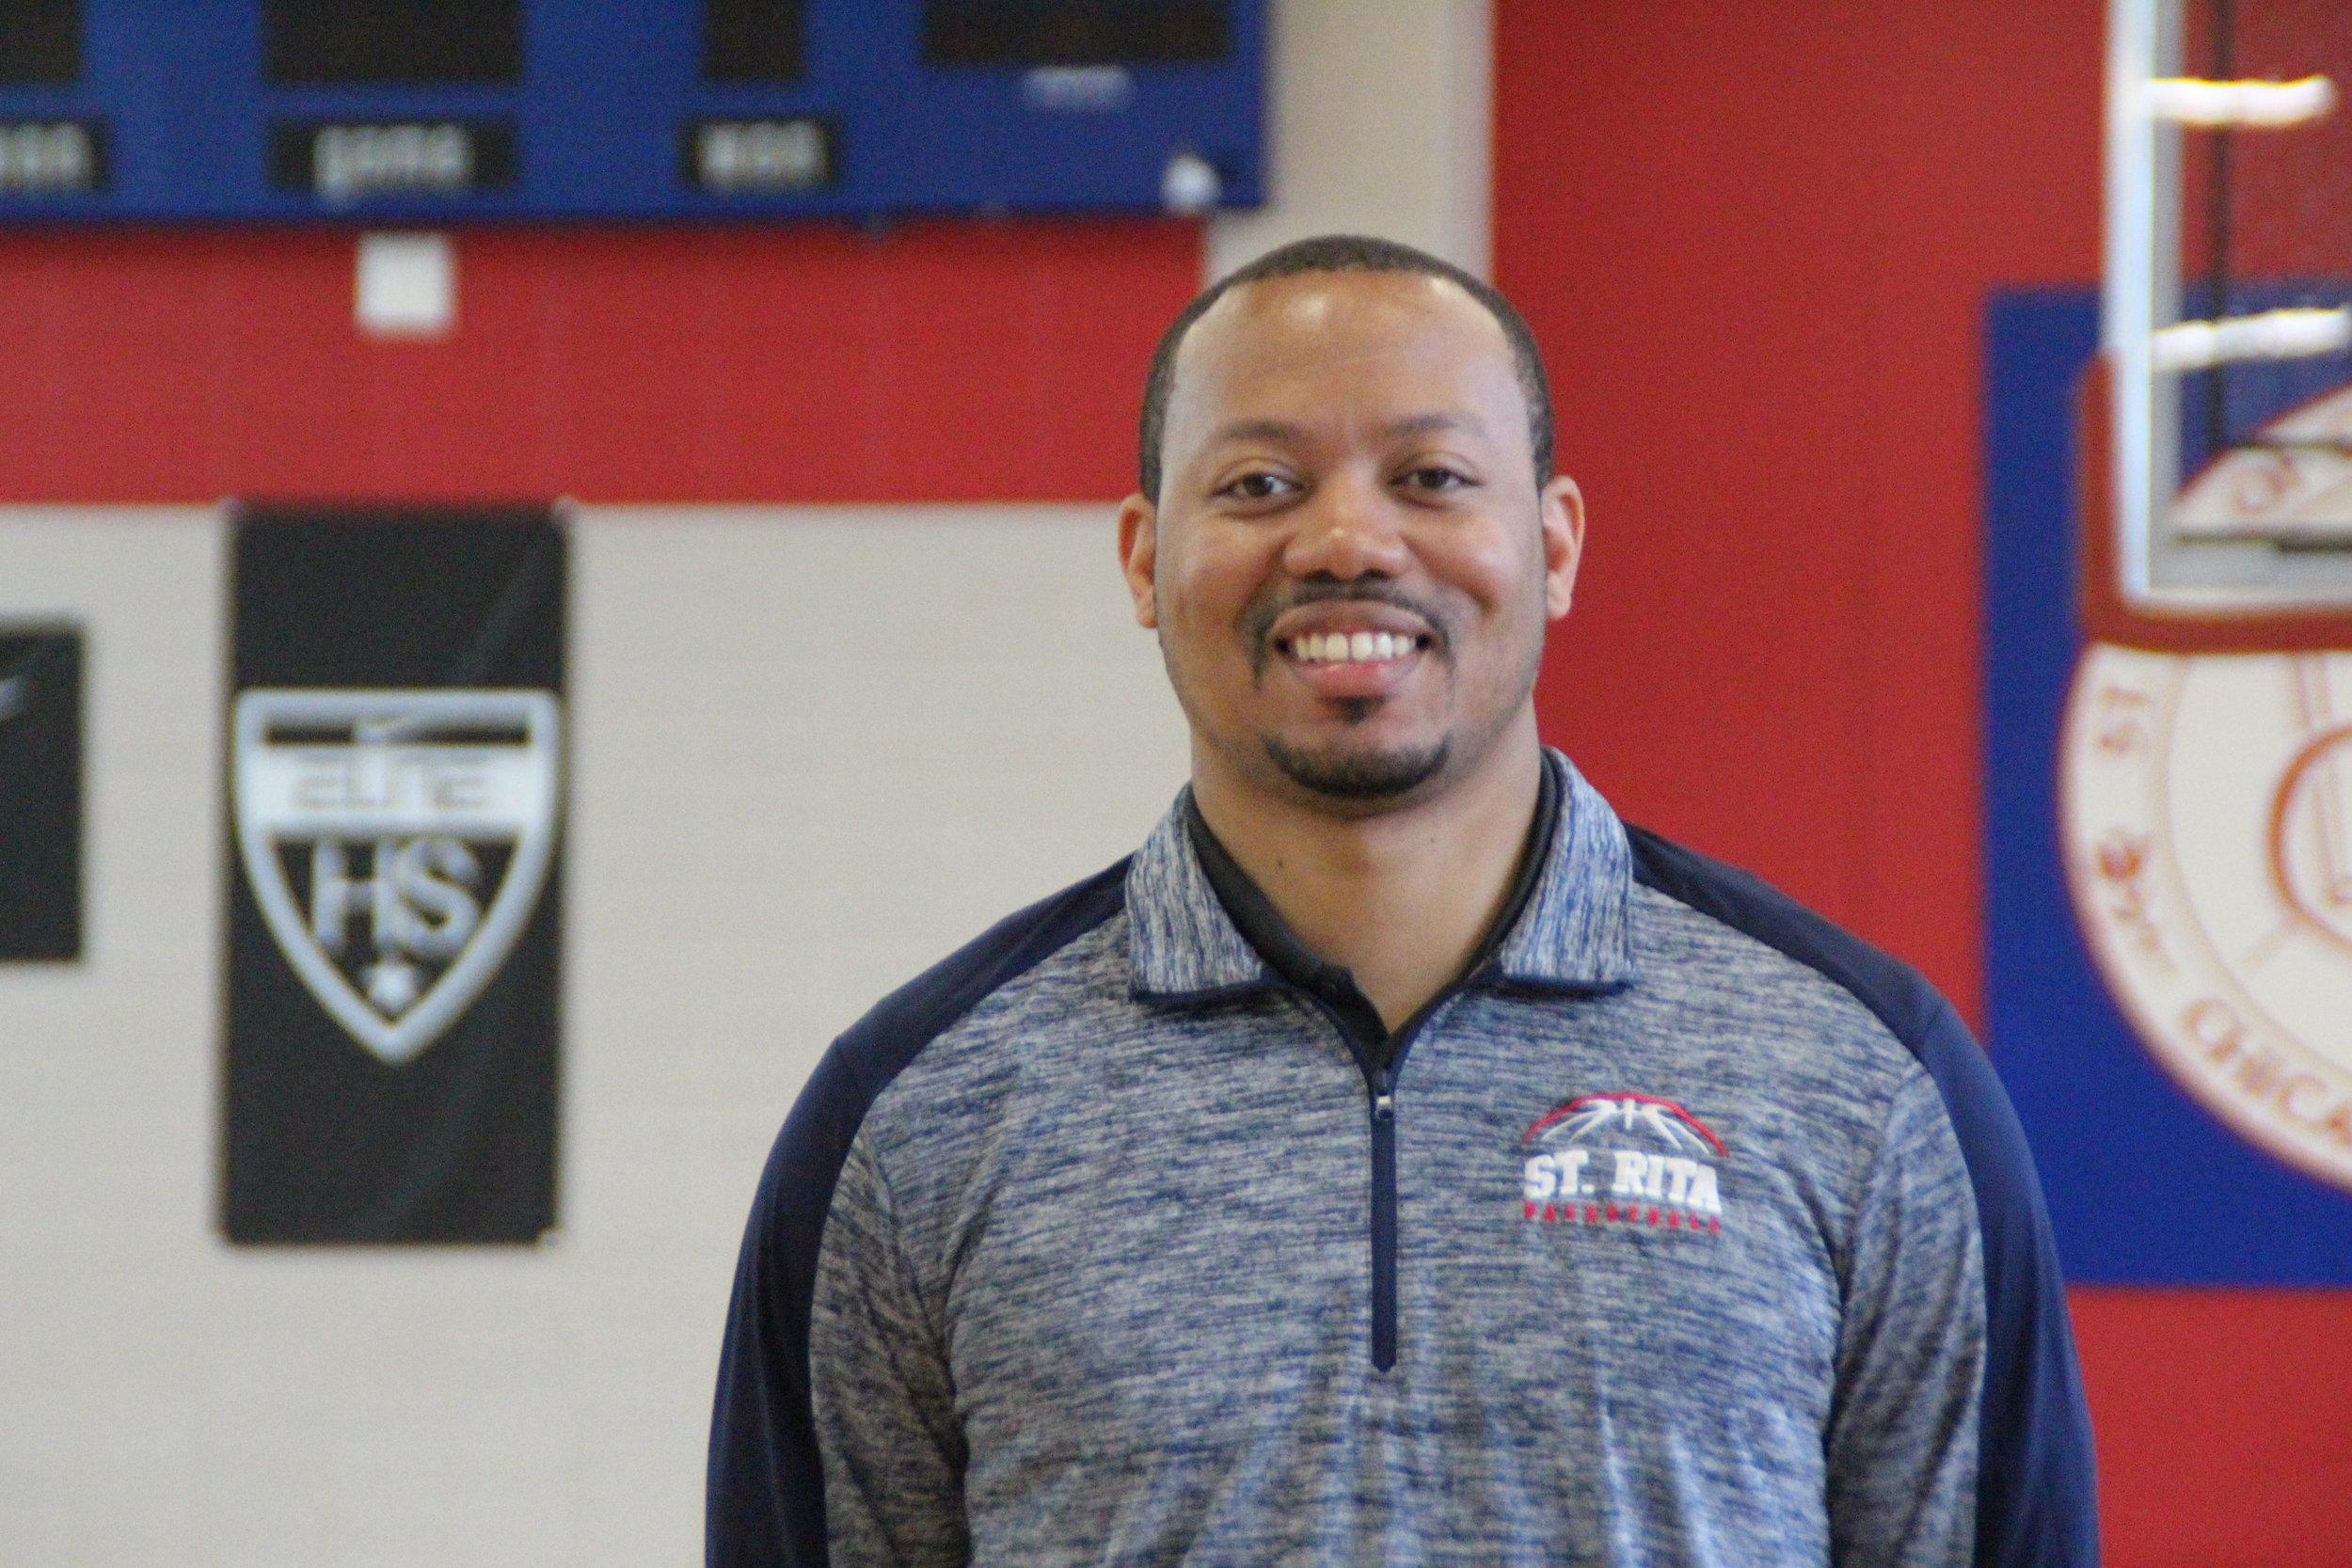 Roshawn Russell '08, St. Rita Head Basketball Coach